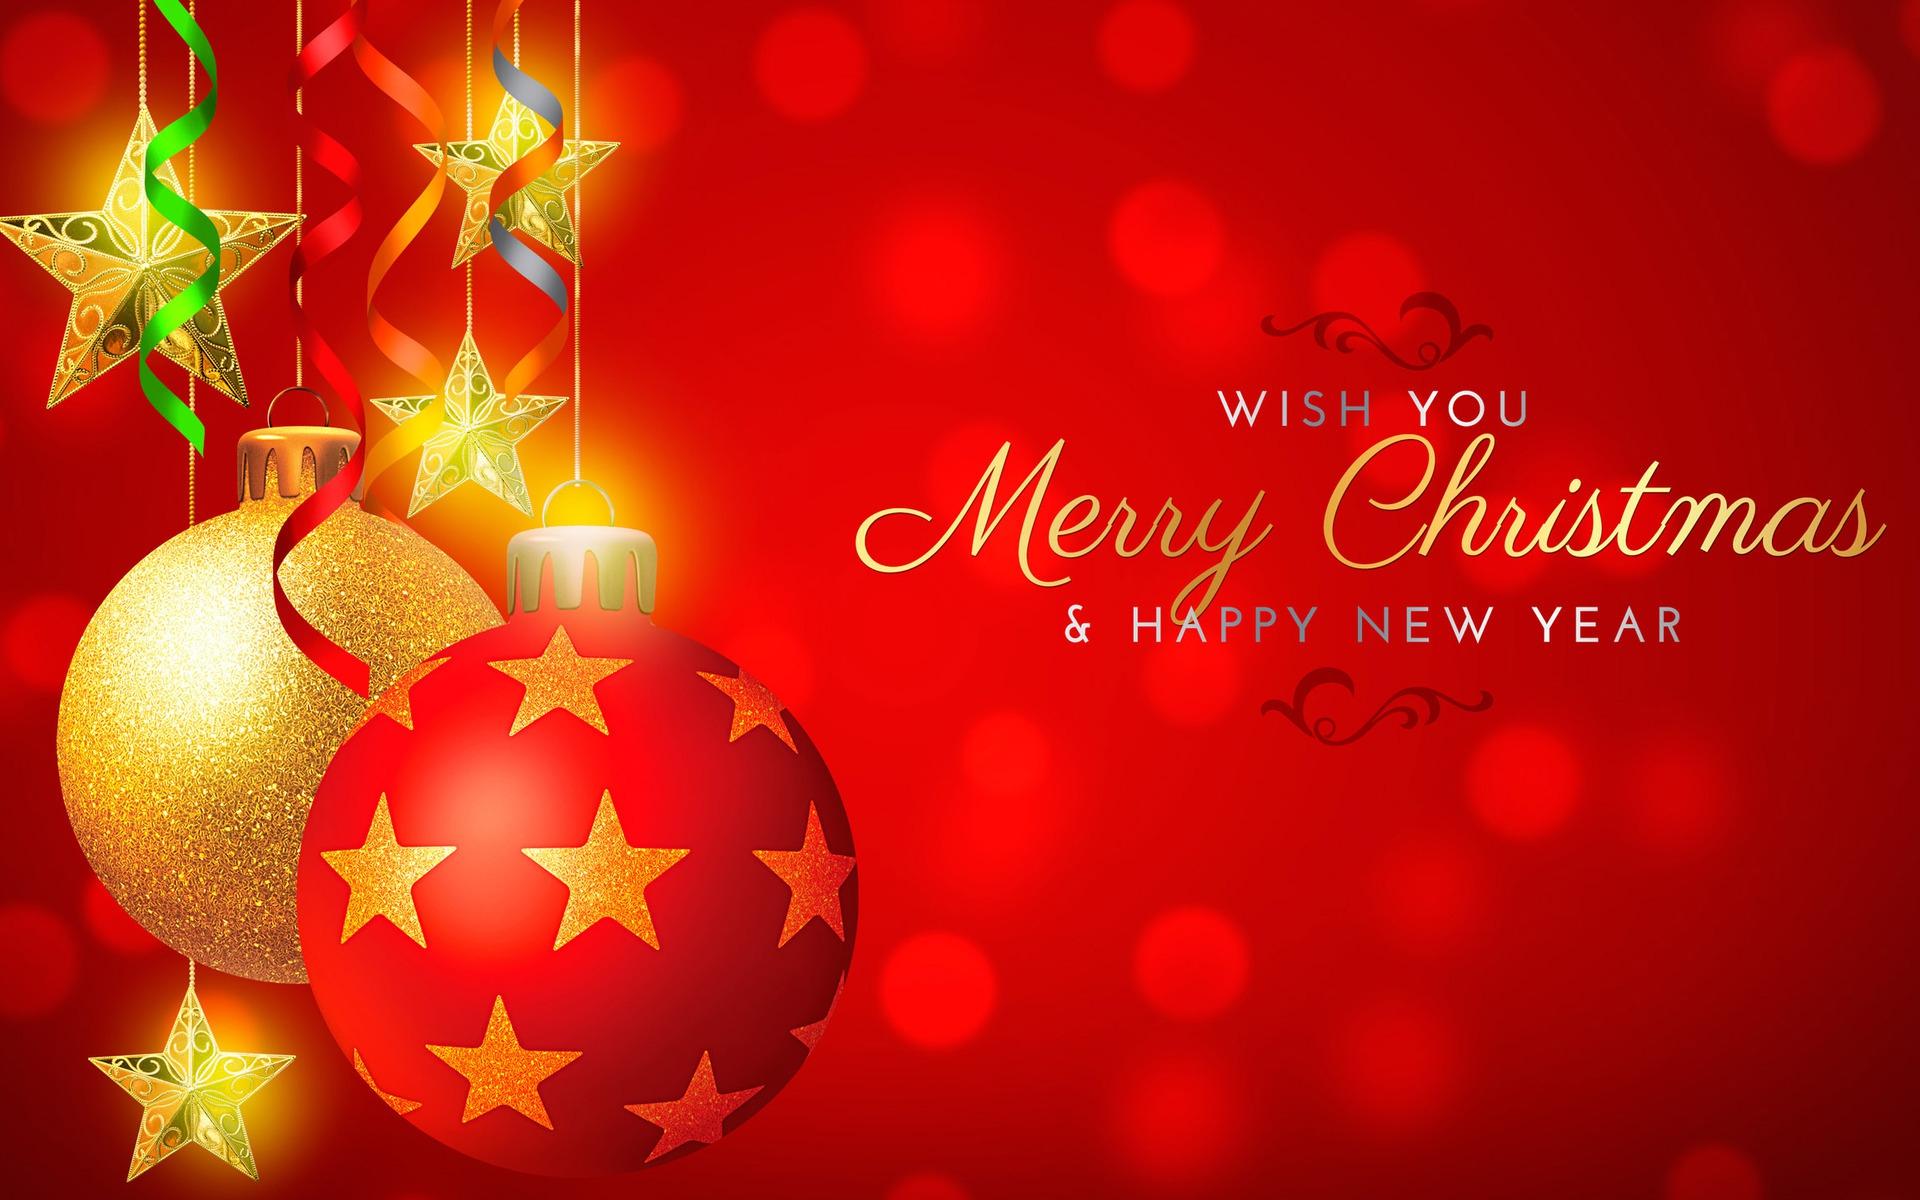 Merry-Christmas-Wallpaper-Widescreen-Red-2019